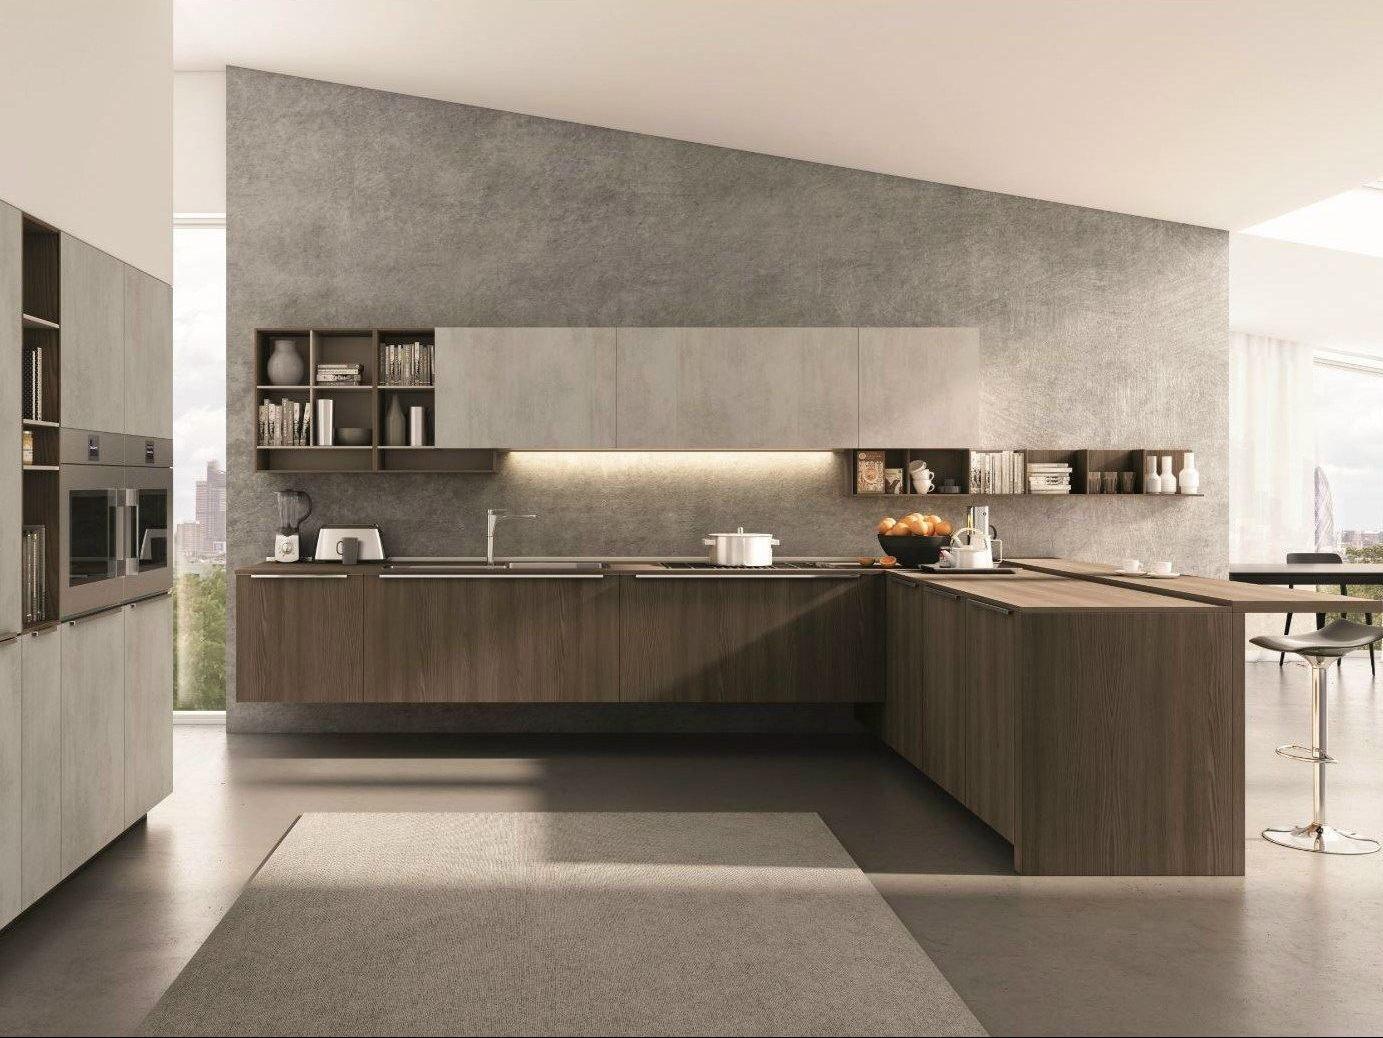 Cucina Componibile Con Penisola Filolain By Euromobil Cucina